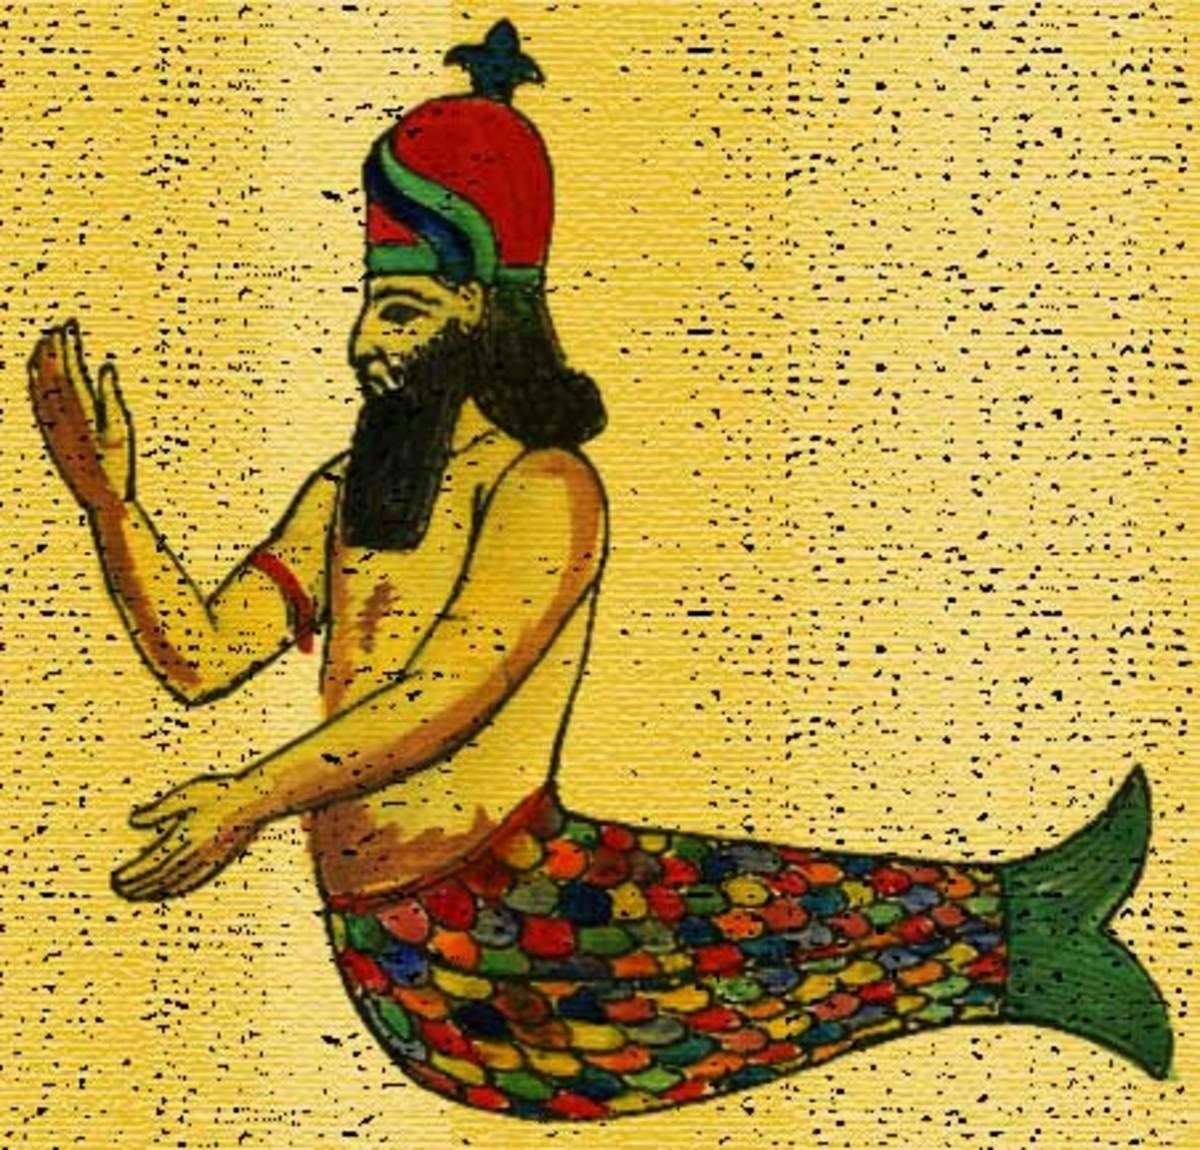 Dagon fish-god of the Philistines